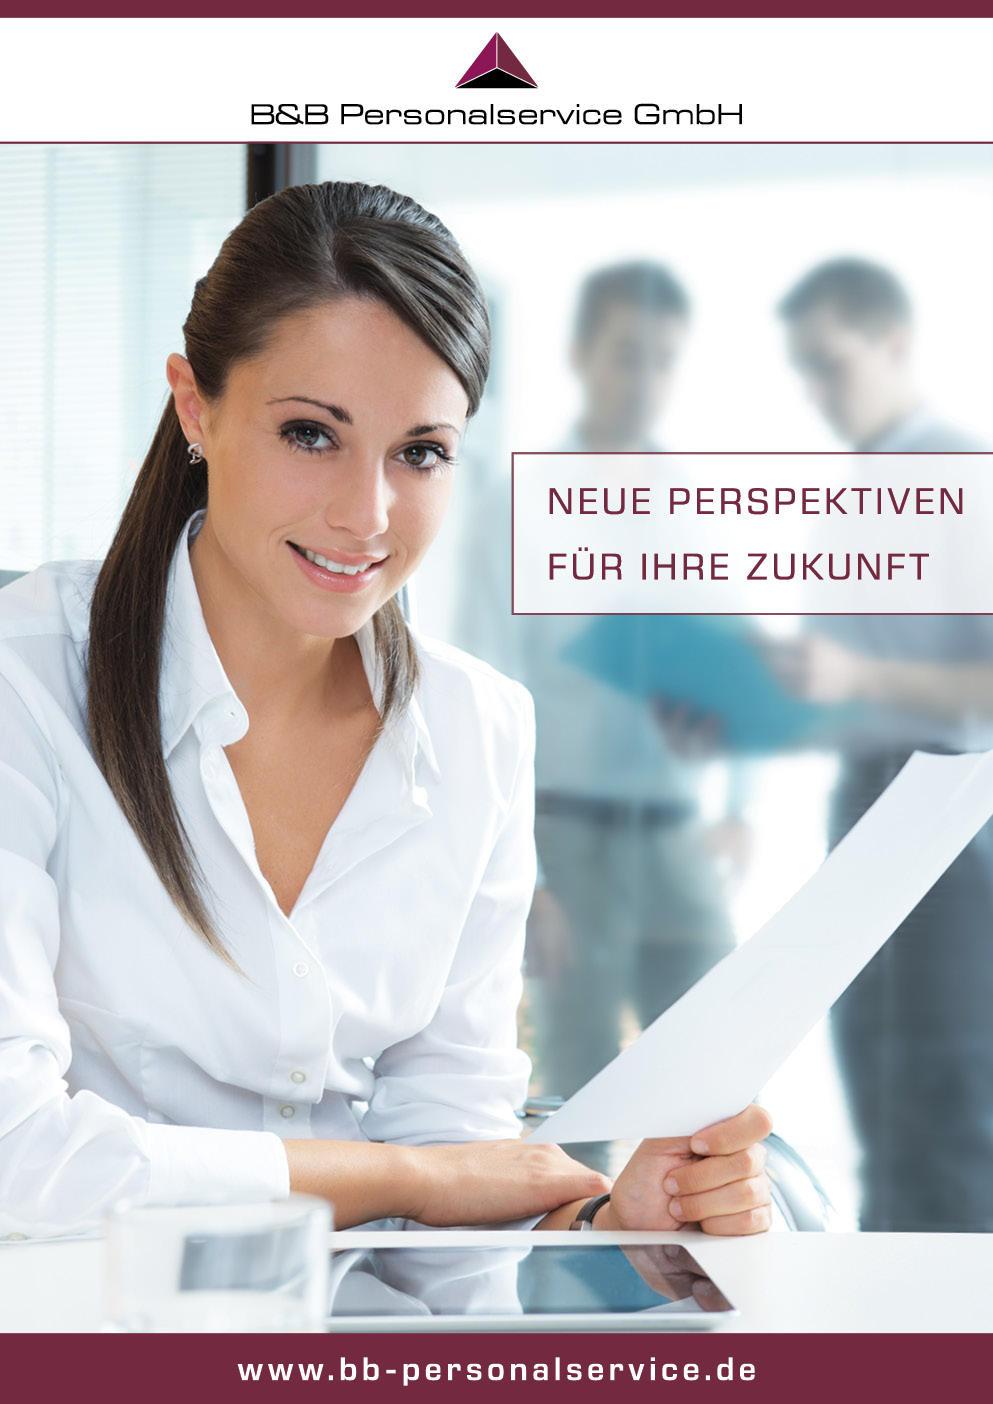 B&B Personalservice GmbH